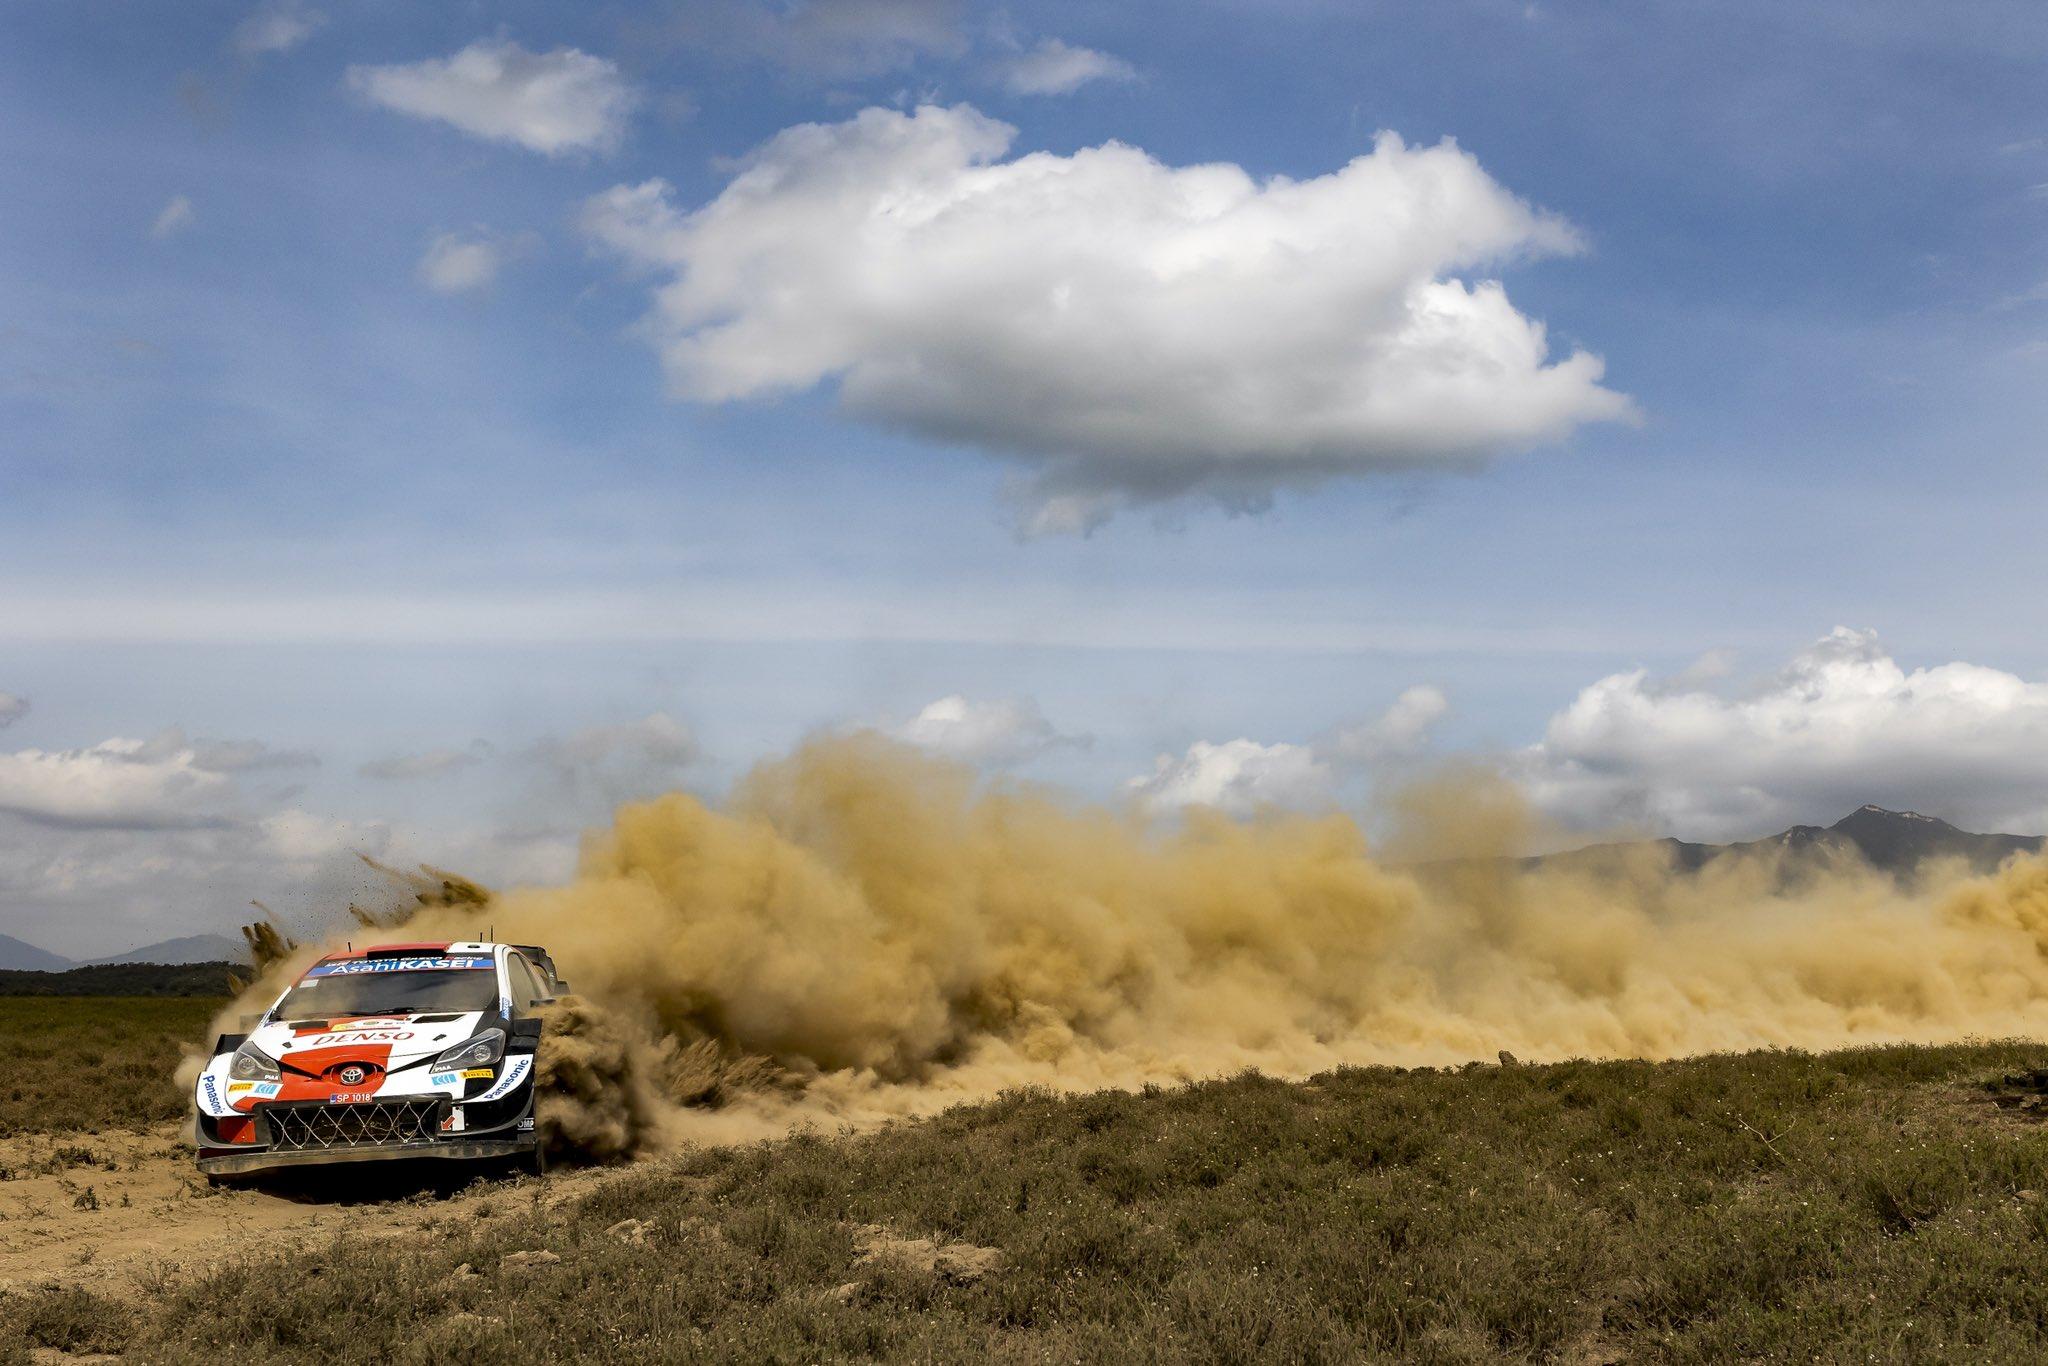 WRC: Safari Rally Kenya [23-27 Junio] - Página 4 E4yXfIdWEAEI6yY?format=jpg&name=large